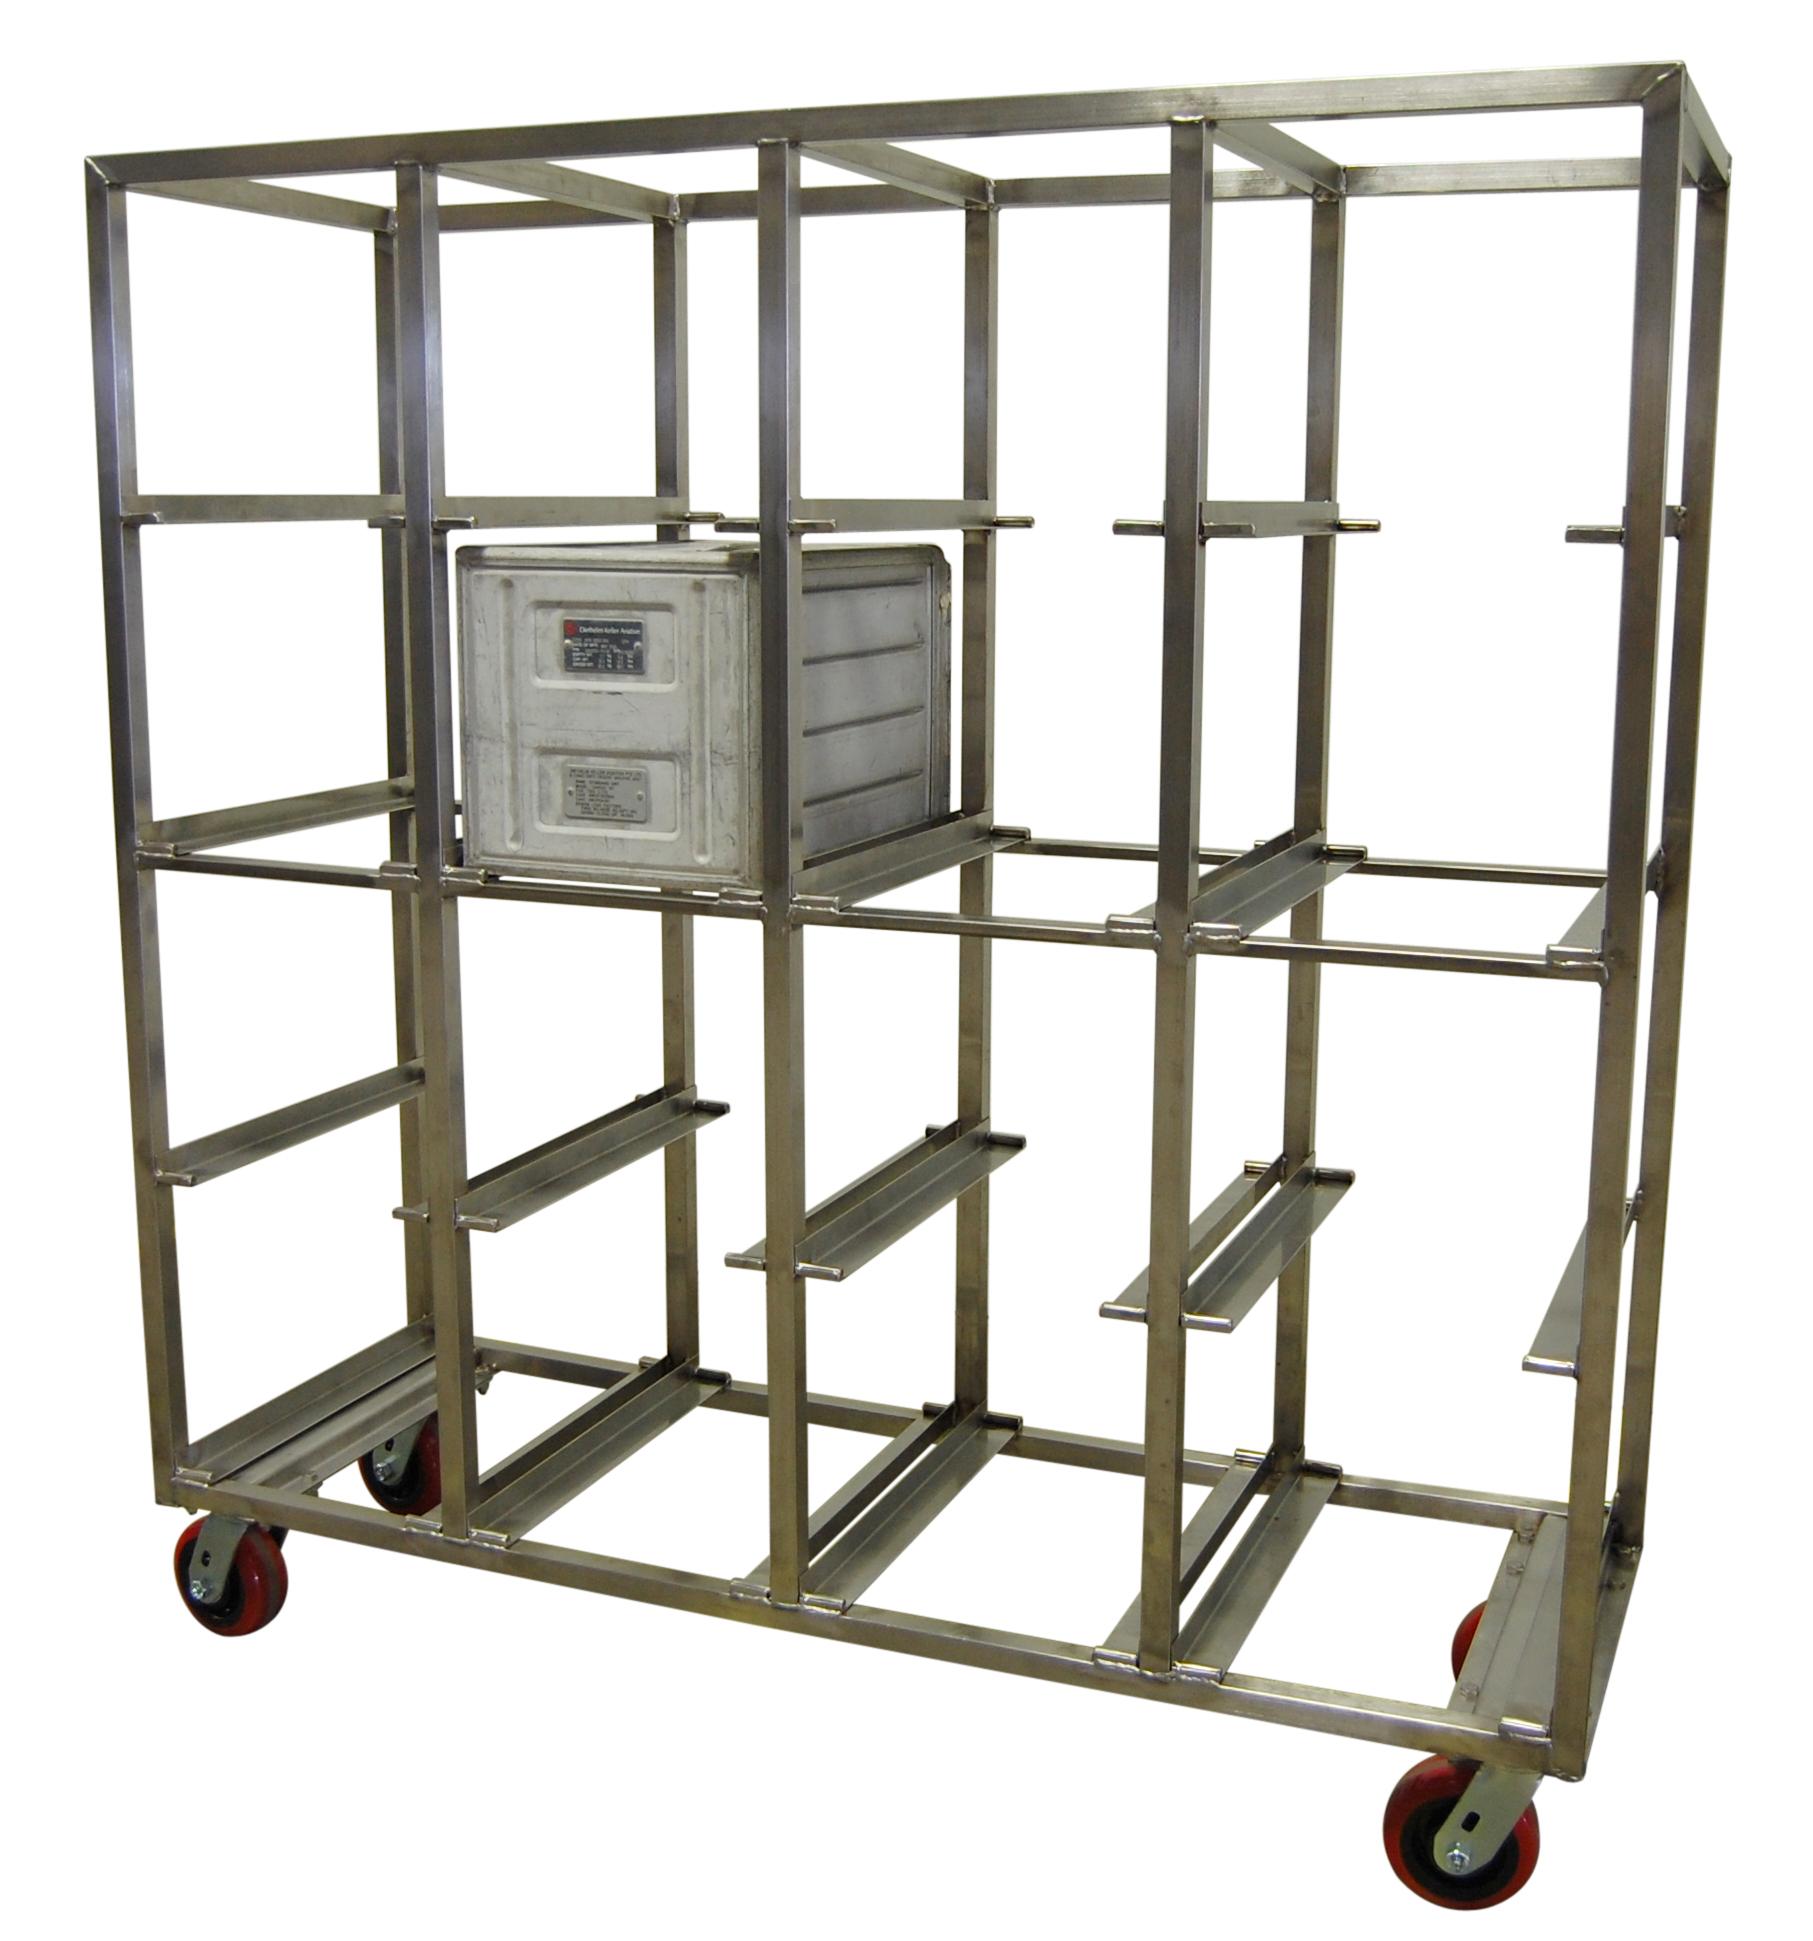 Airline Galley Transport Storage 16 Bin Rack Ela Enterprises